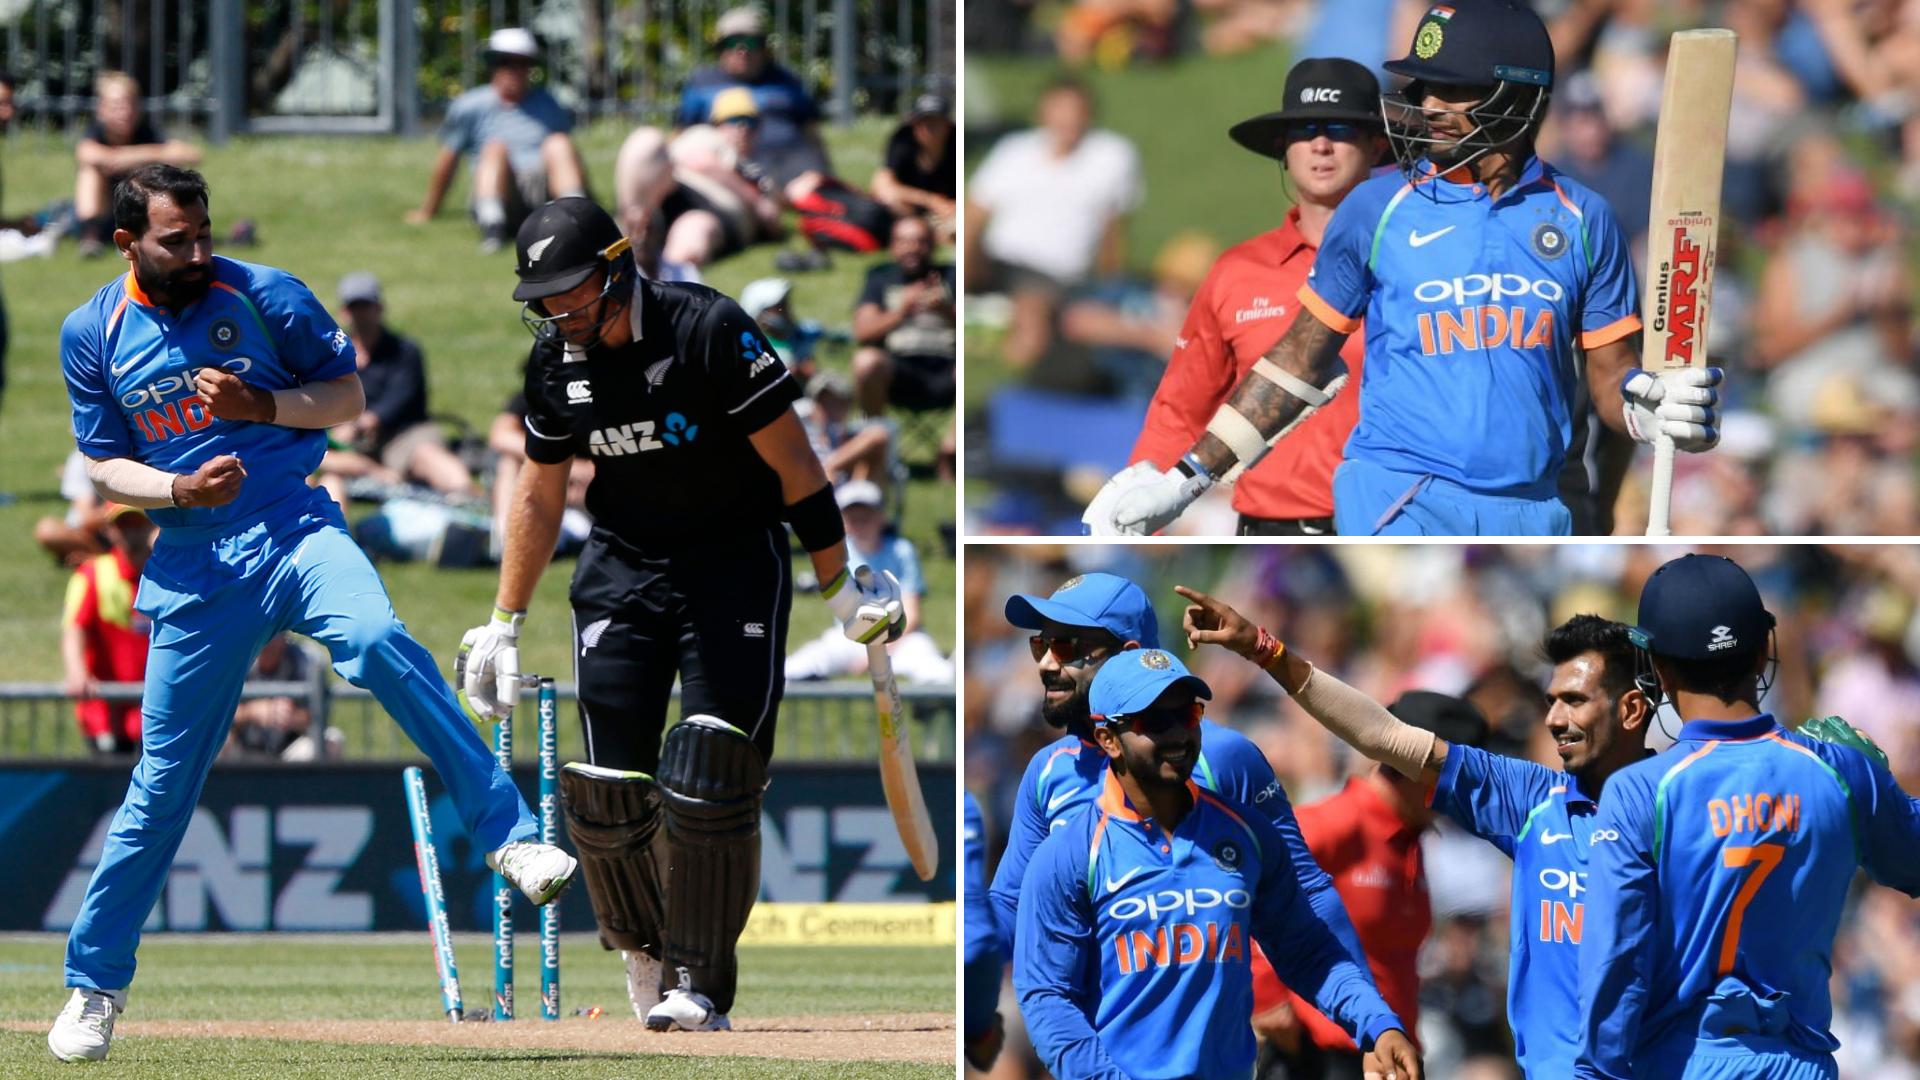 Shami, Spinners & Shikhar See India Sail in Series-opener vs Kiwis